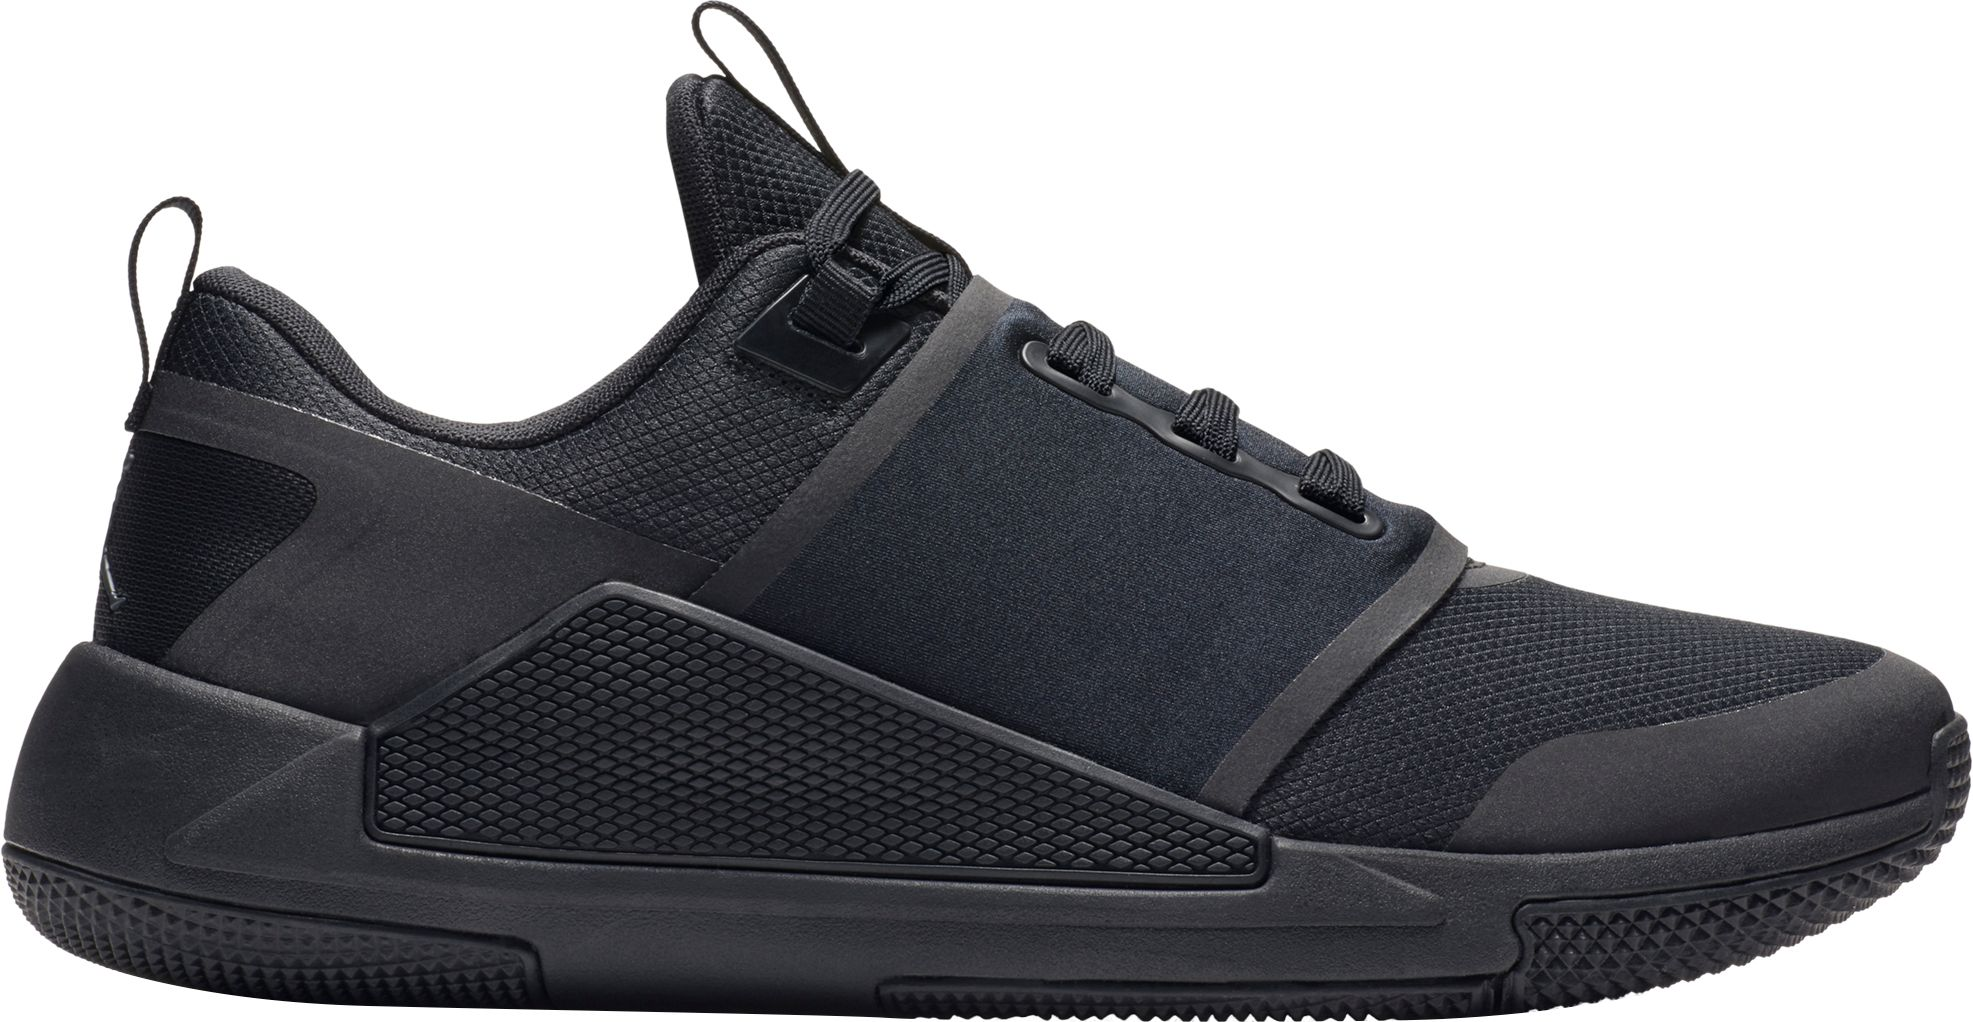 detailed look b688d 9e2c7 Jordan Men s Delta Speed TR Training Shoes, Size  10.0, Black